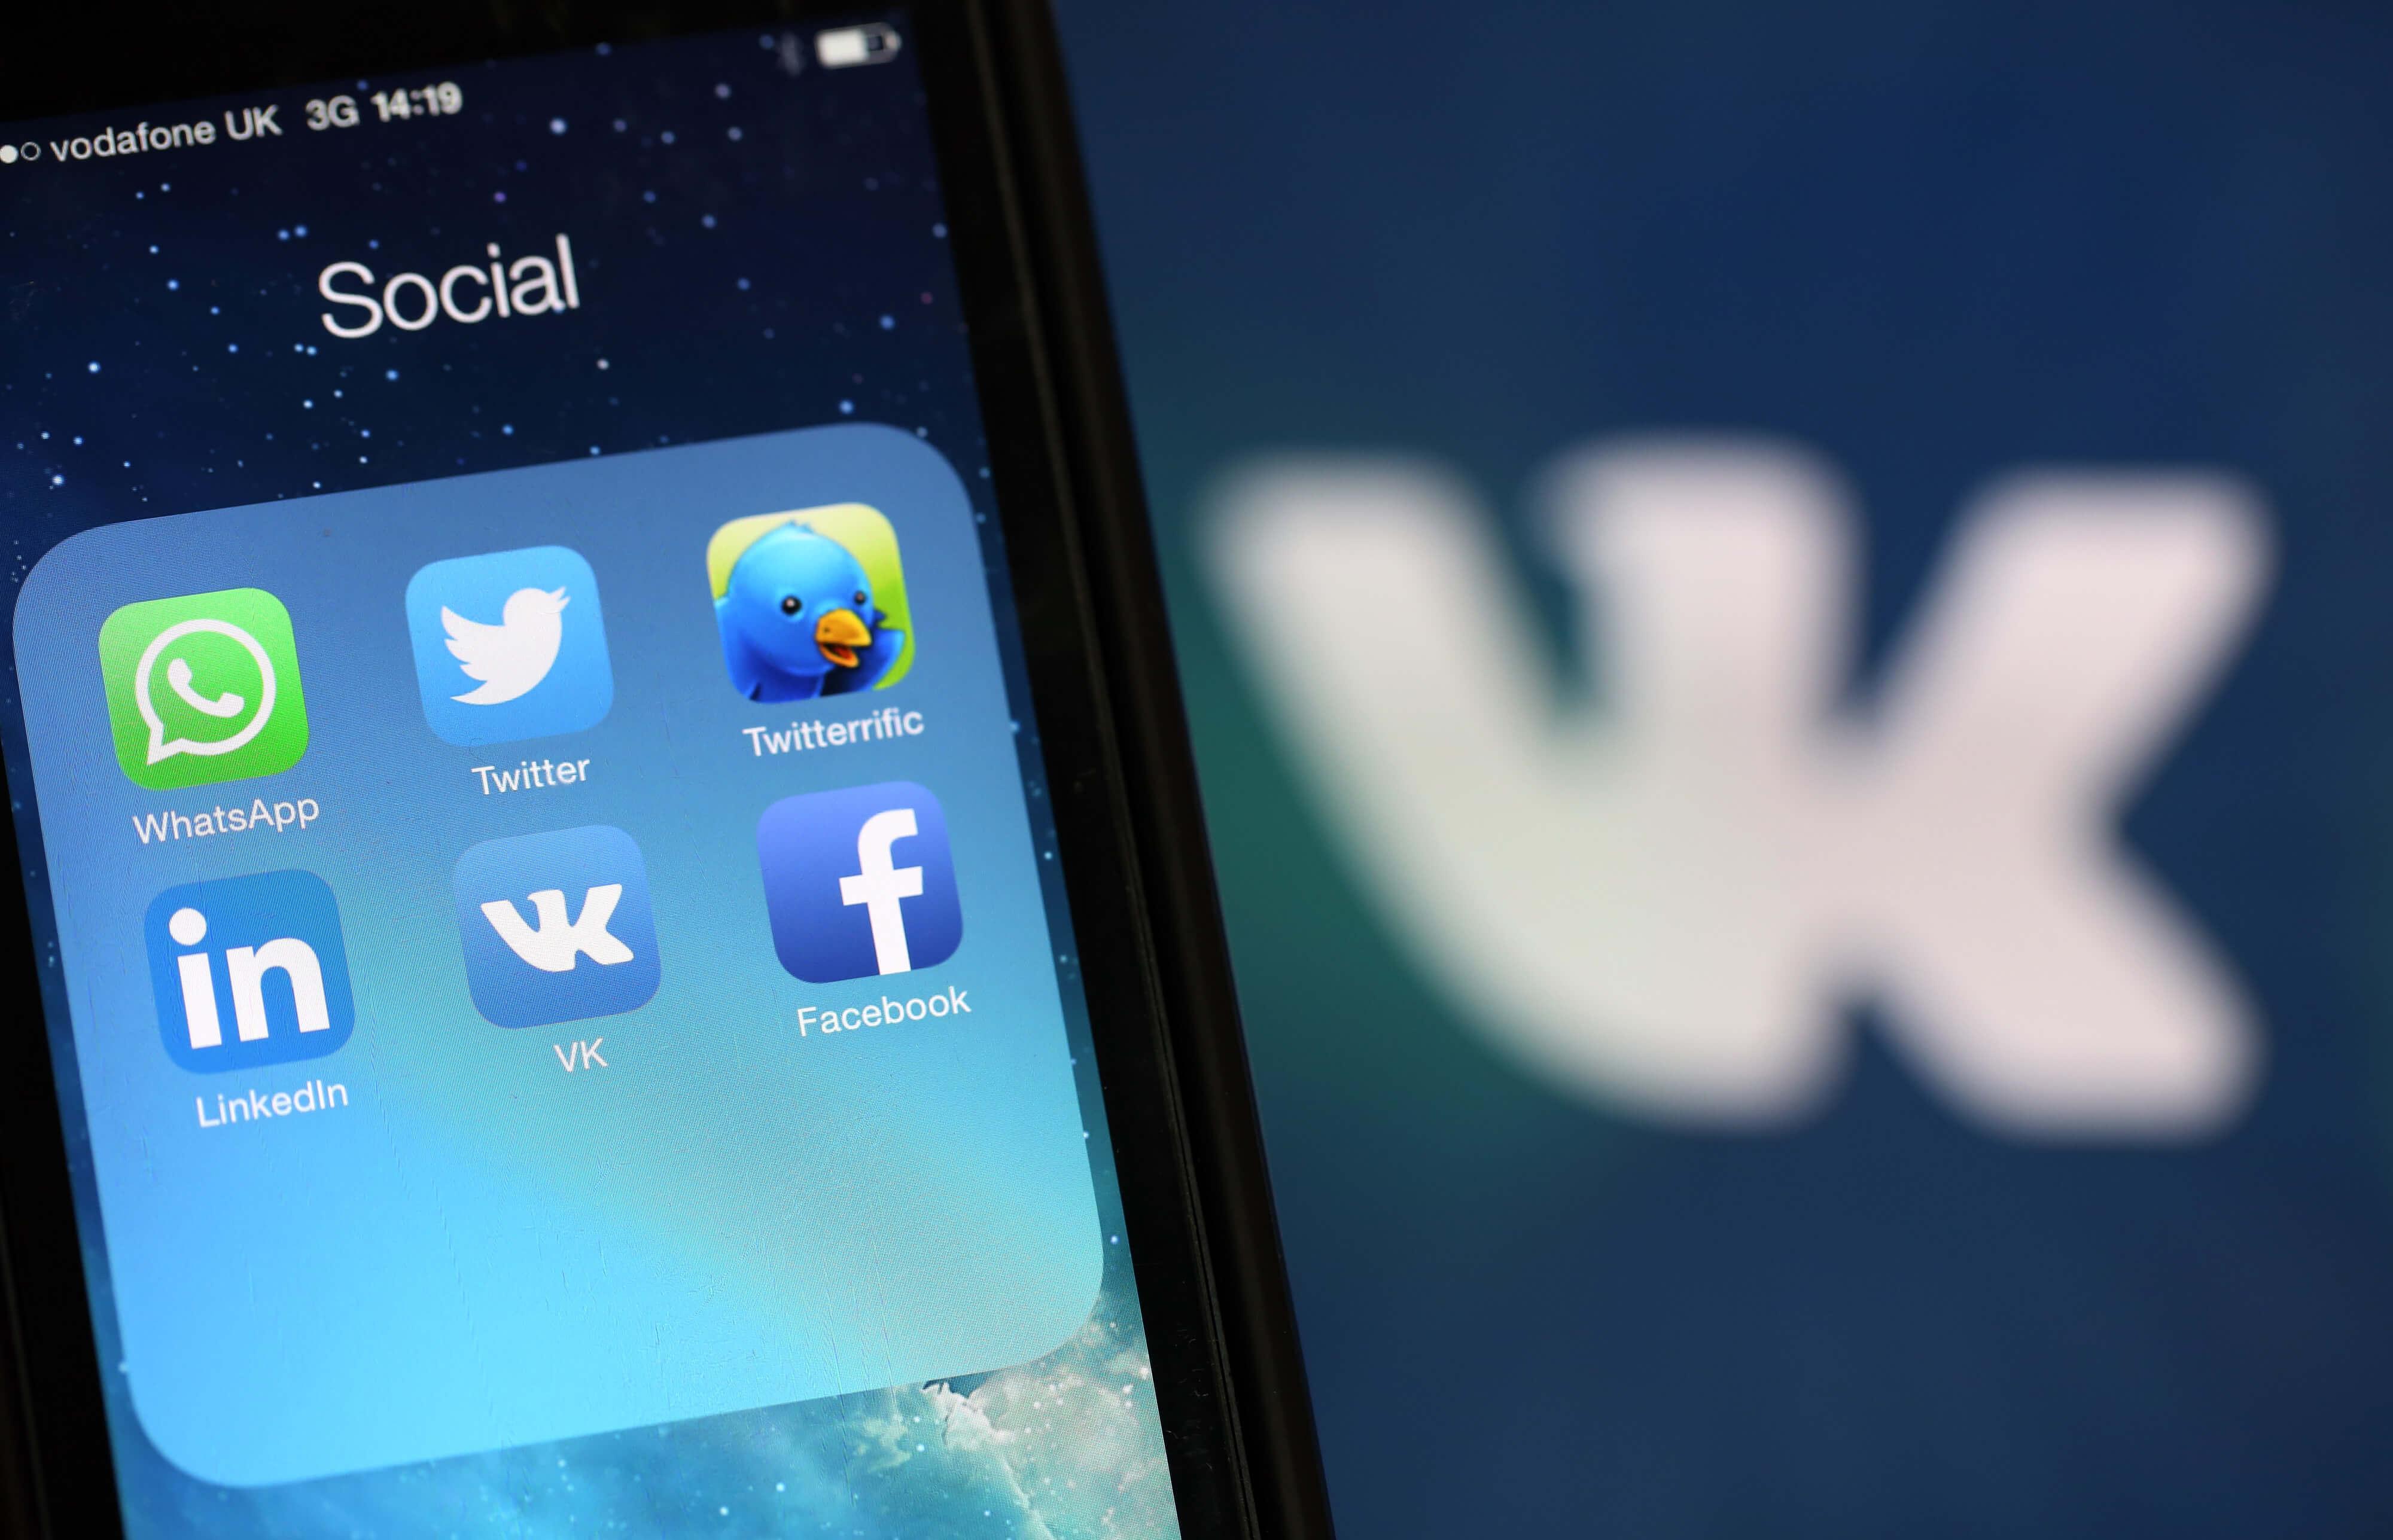 В России вступил в силу закон о запрете мата в интернете